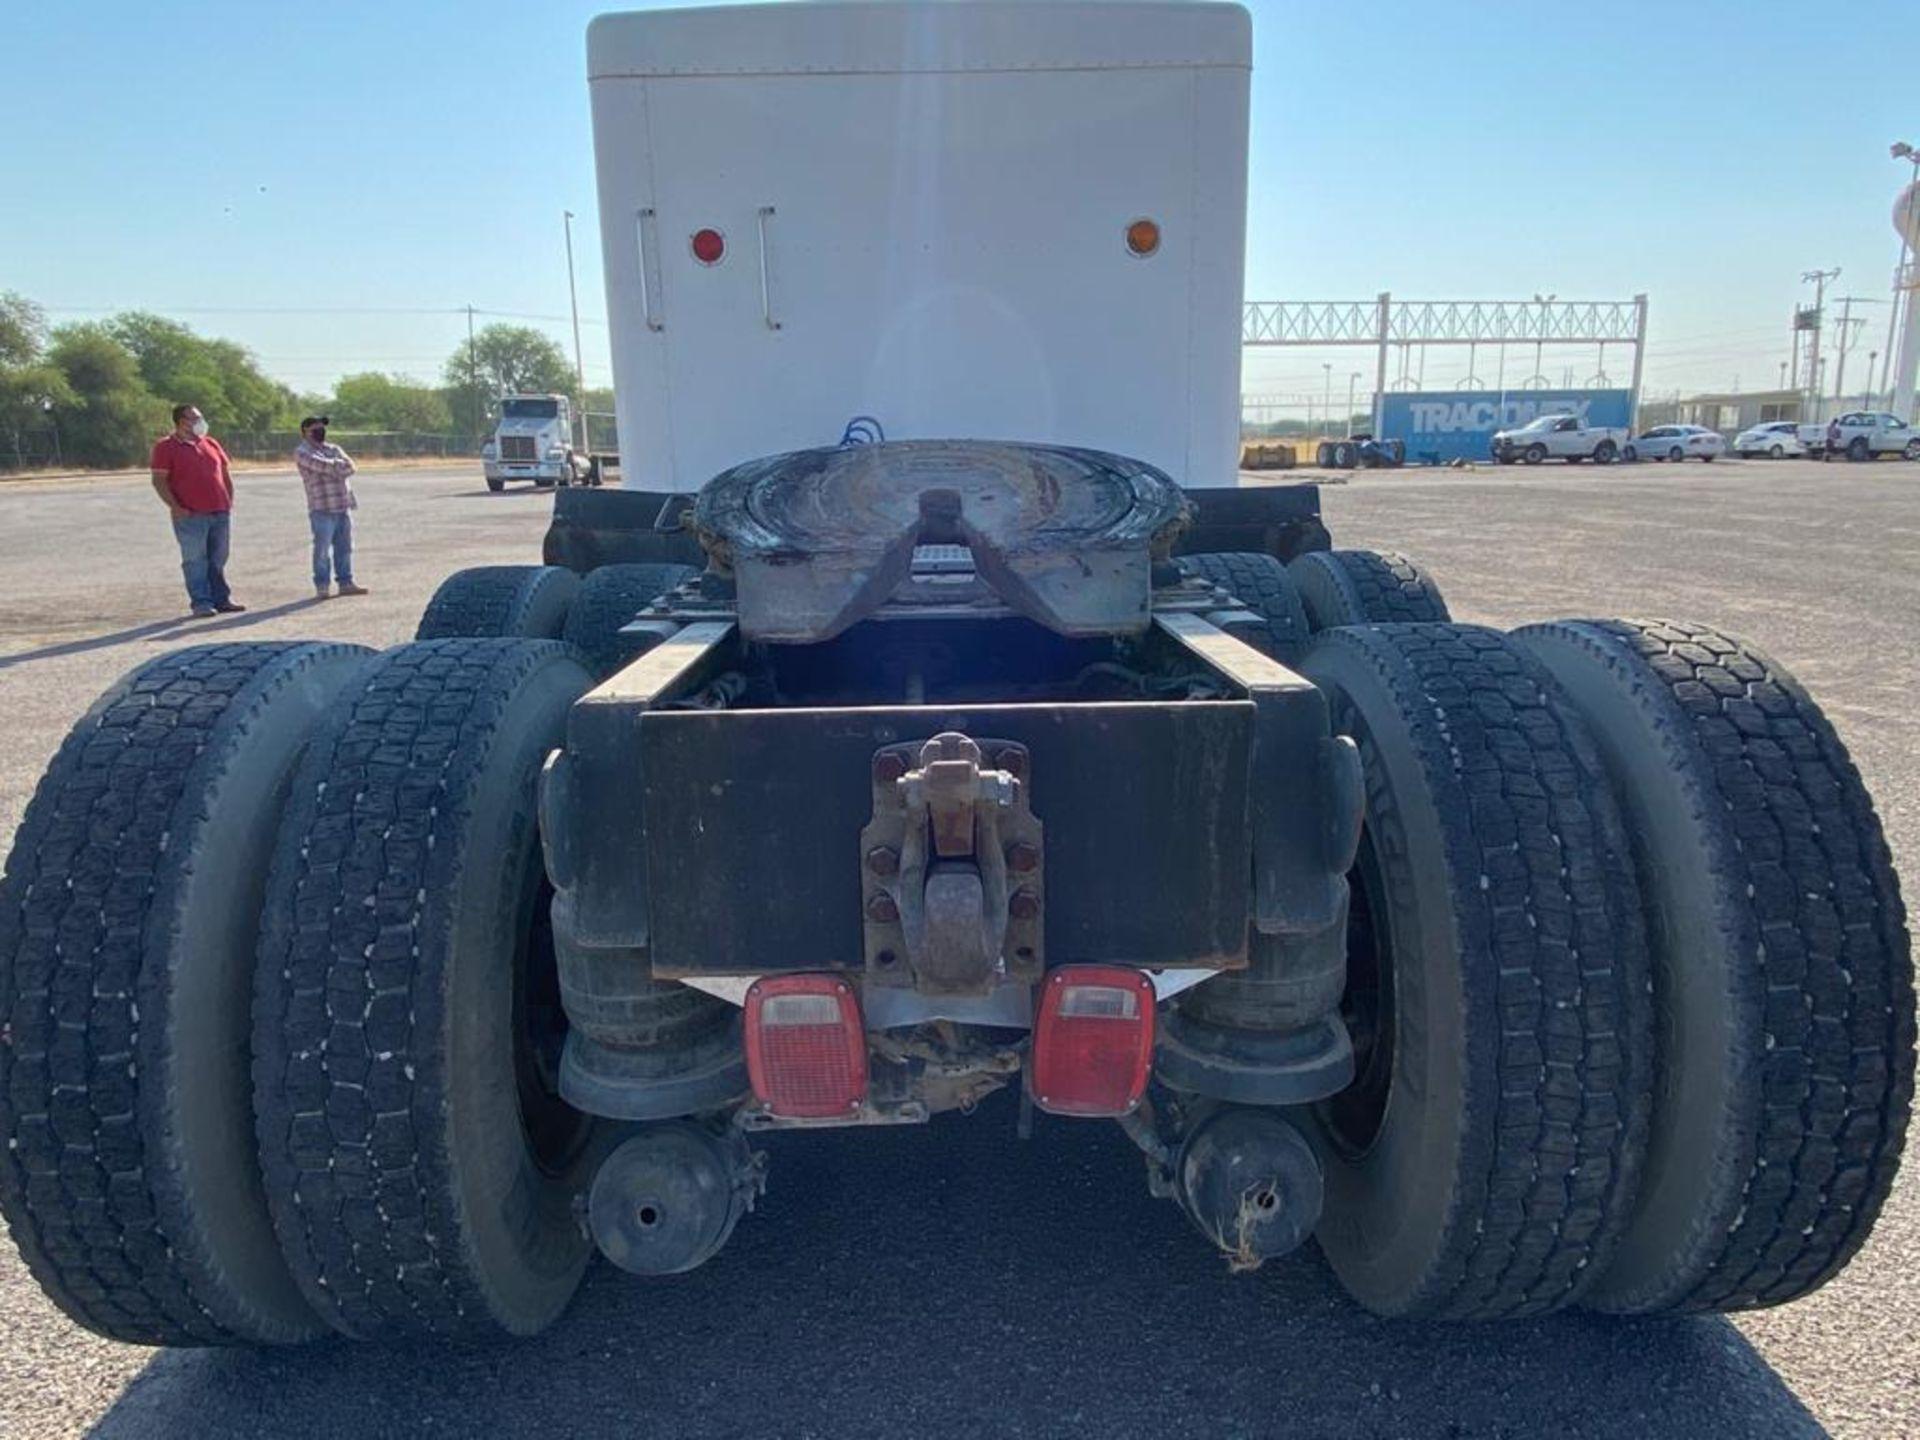 1998 Kenworth Sleeper Truck Tractor, standard transmission of 18 speeds - Image 12 of 55